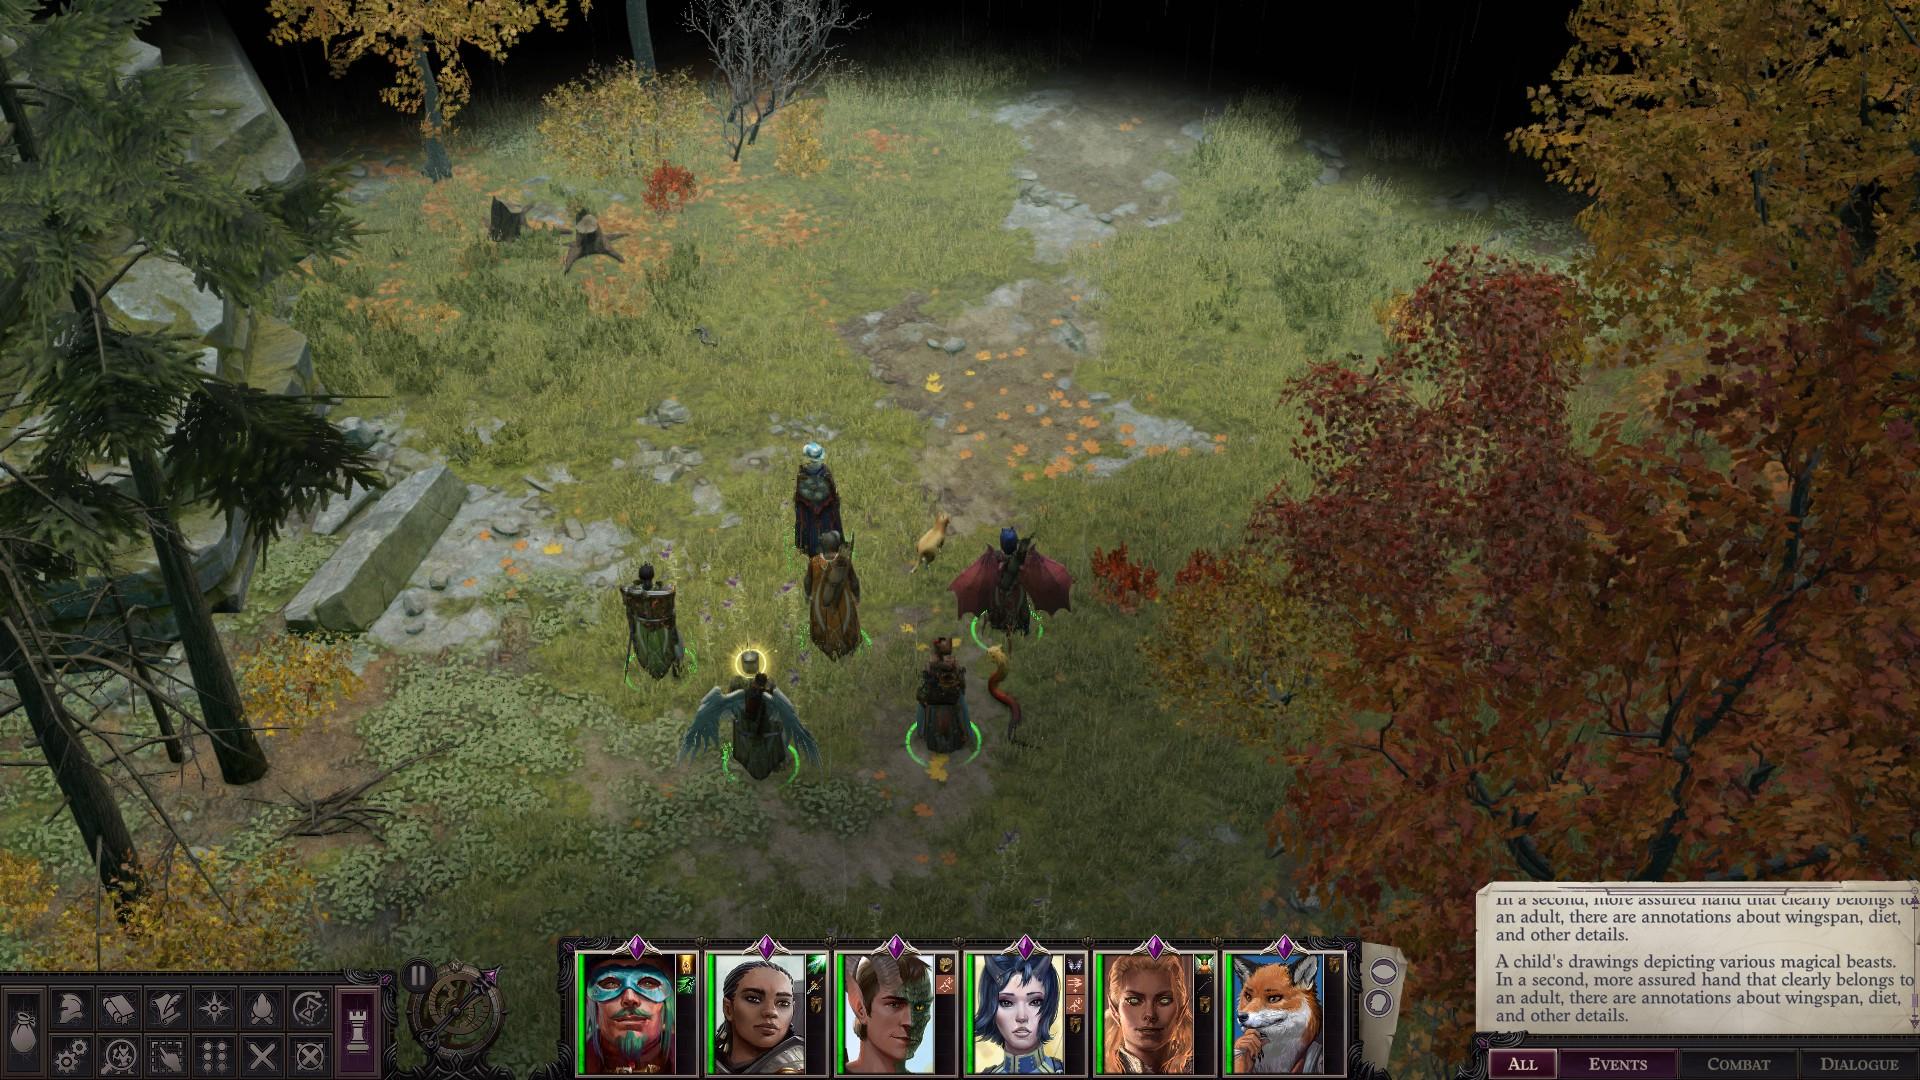 Adventurers cross a green field beneath autumn leaves